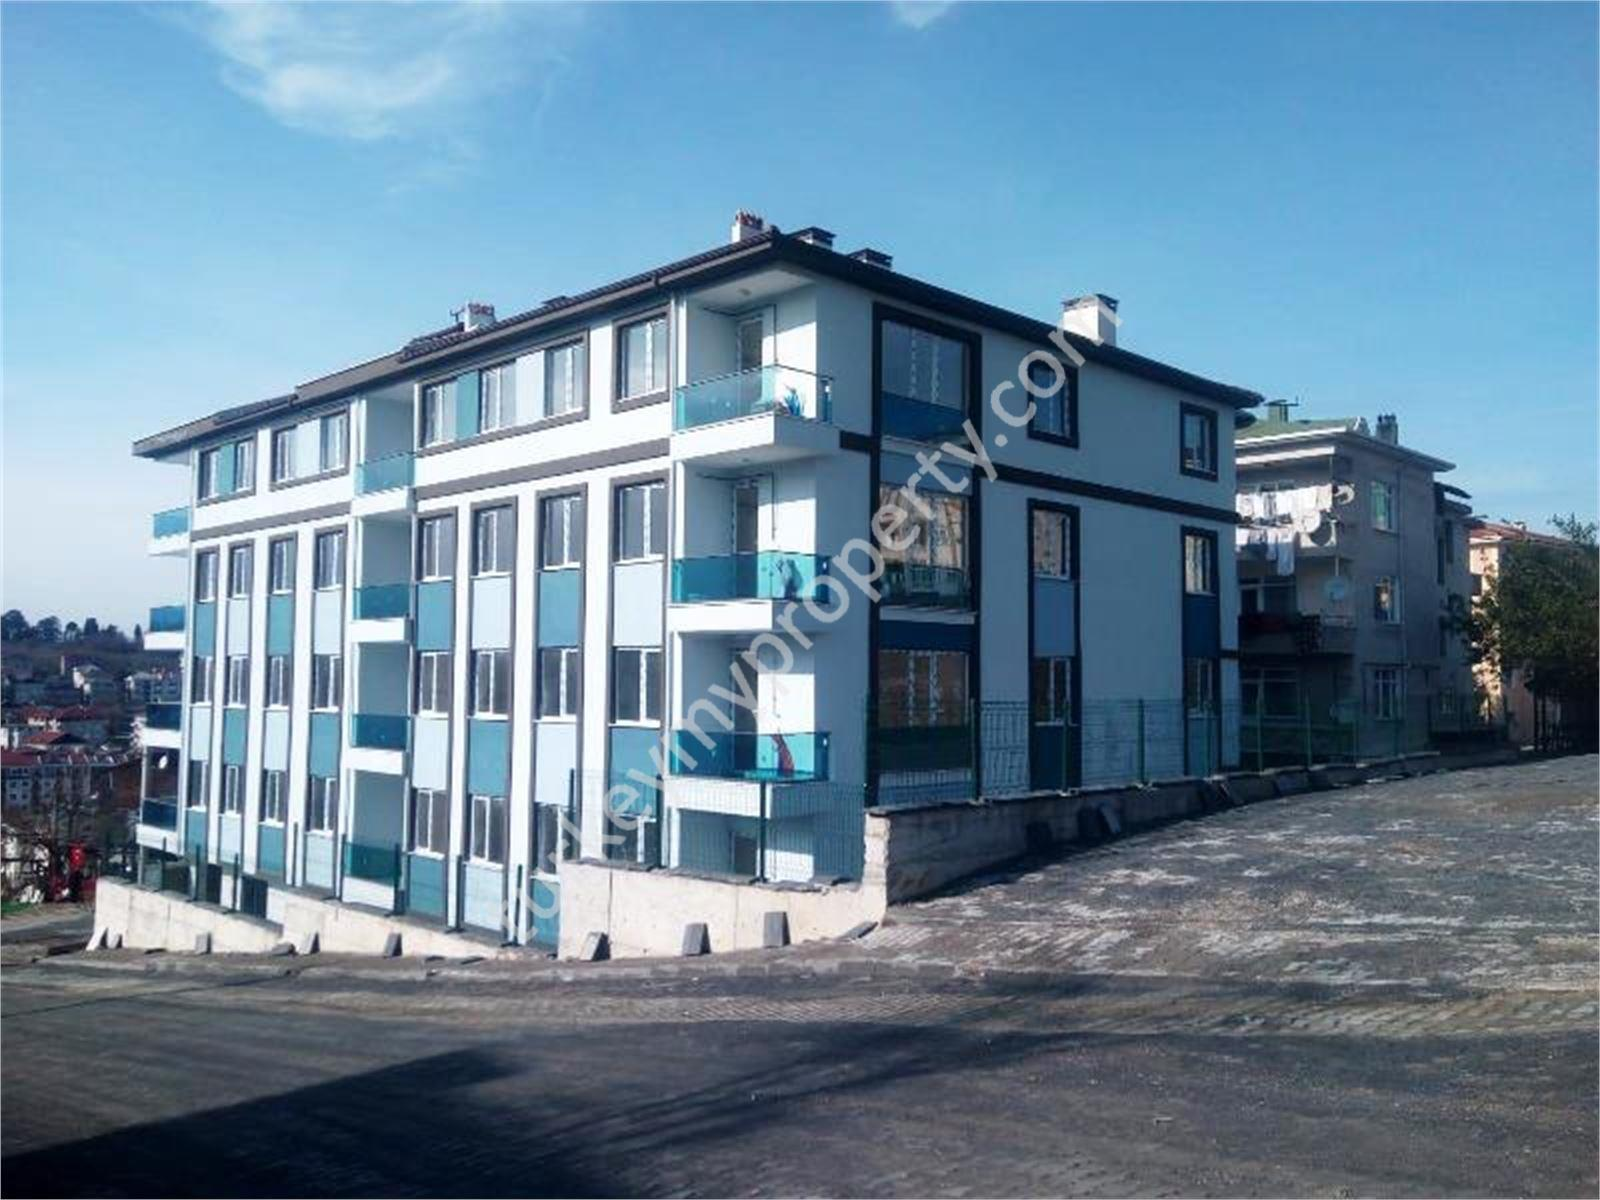 Exclusive lifestyle apartments in Akçakoca